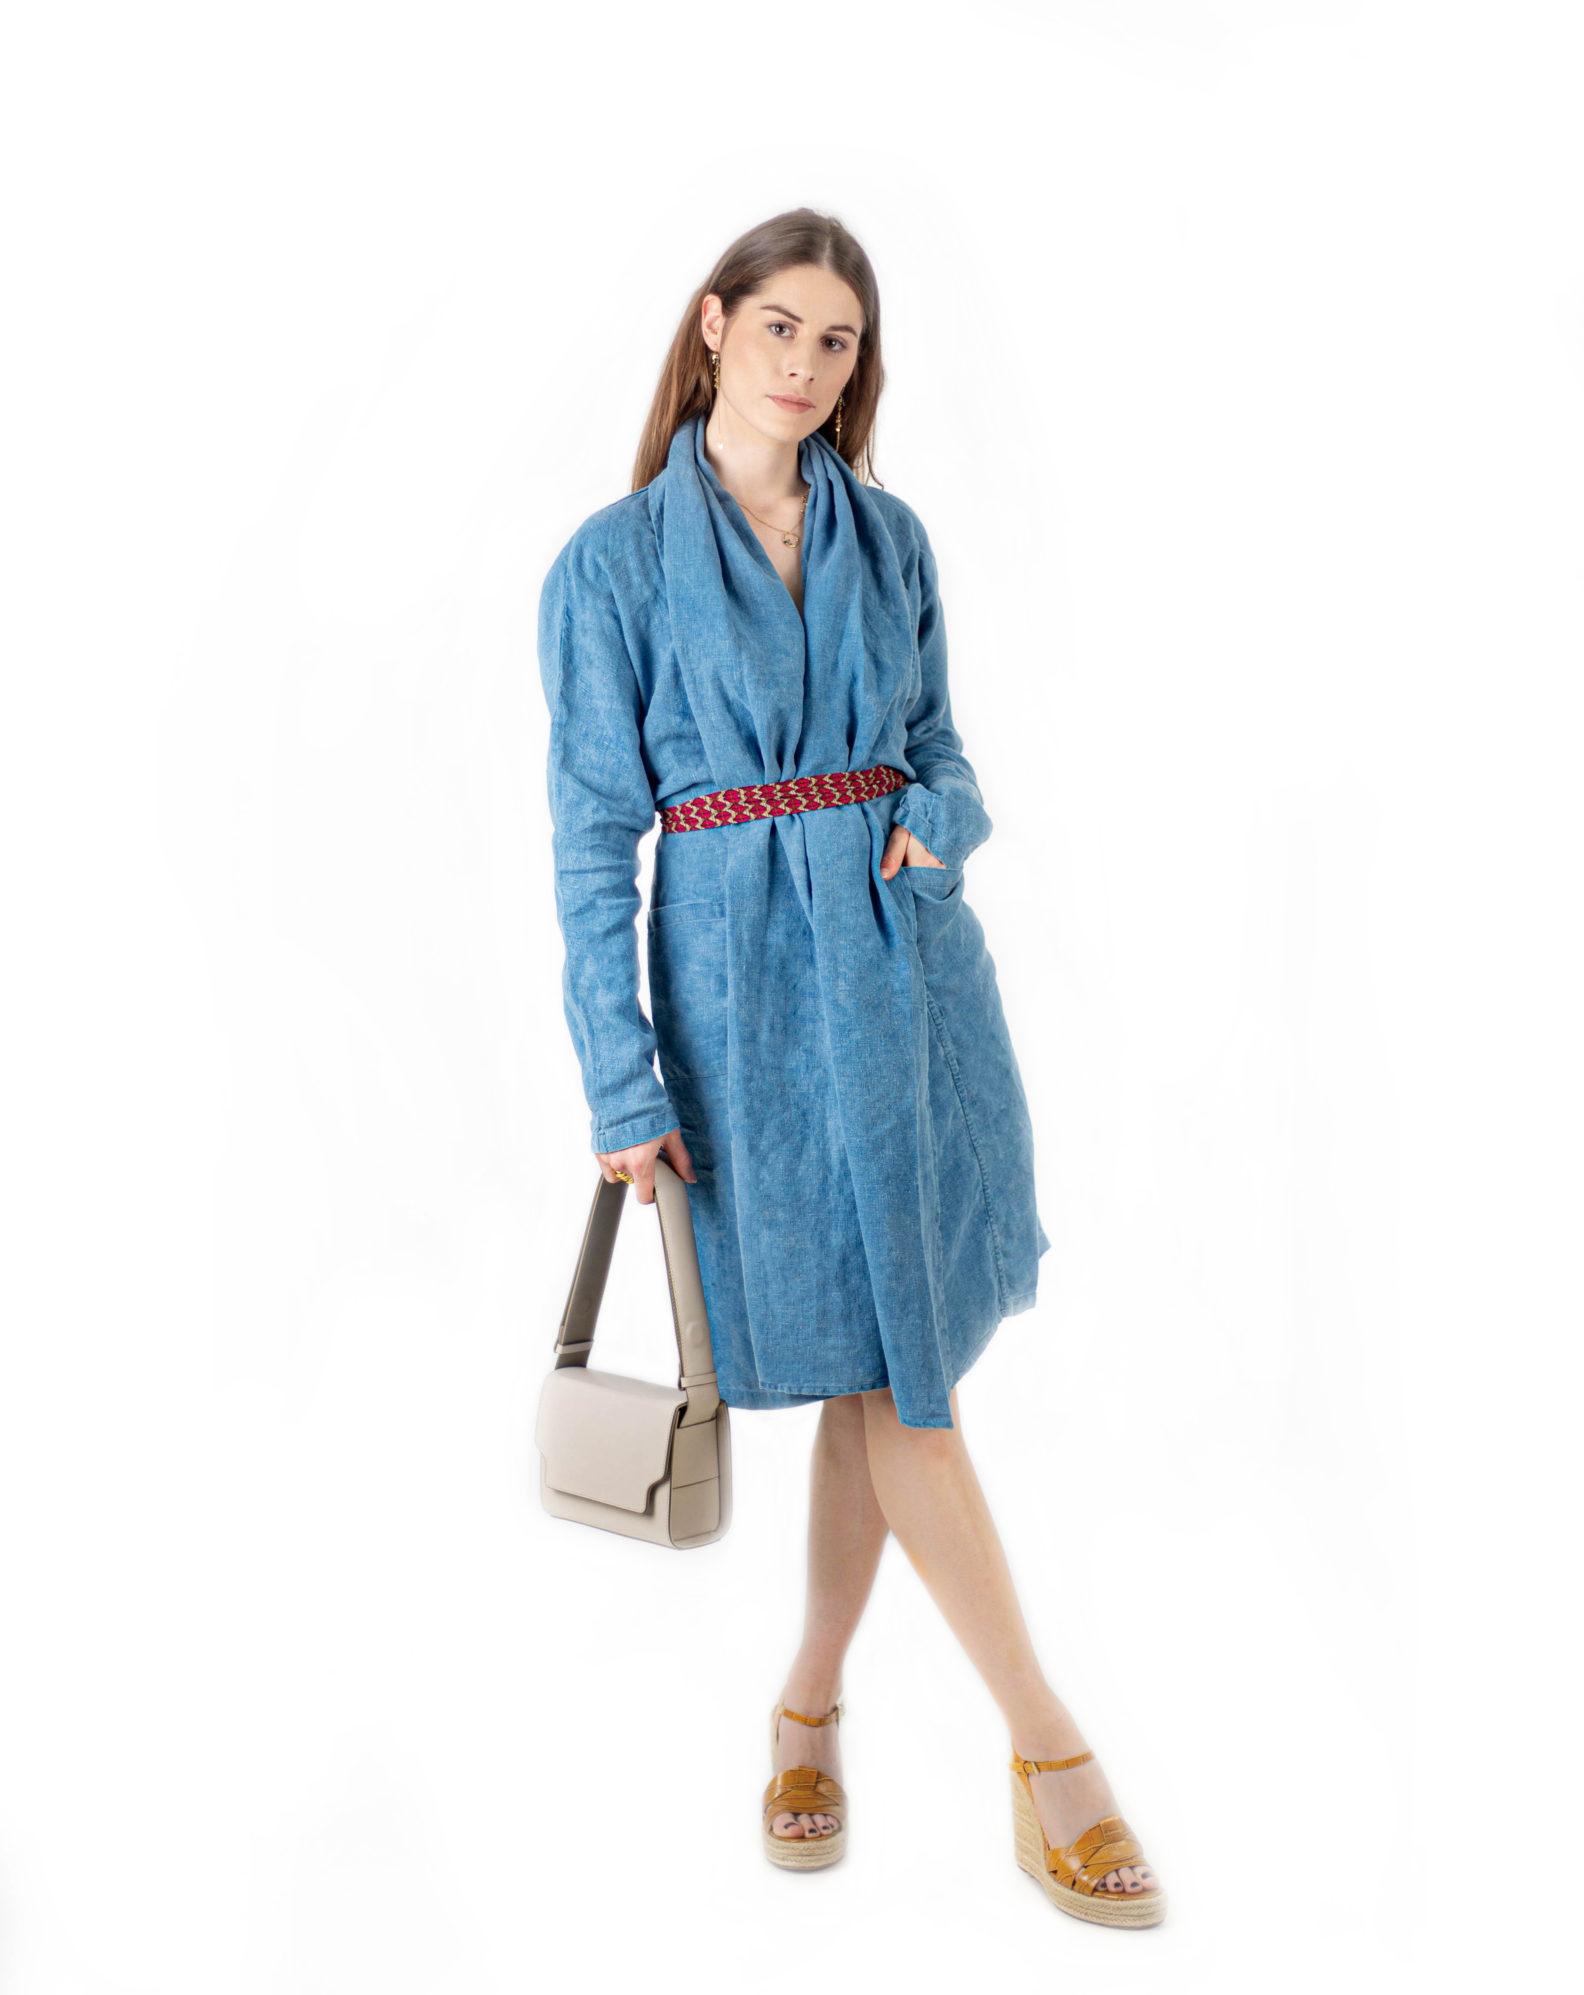 Longue veste écharpe kimono -Long linen dress-coat-Kimono-1-affaires-etrangeres-bleu-de-cocagne-robe-kimono-long-lin